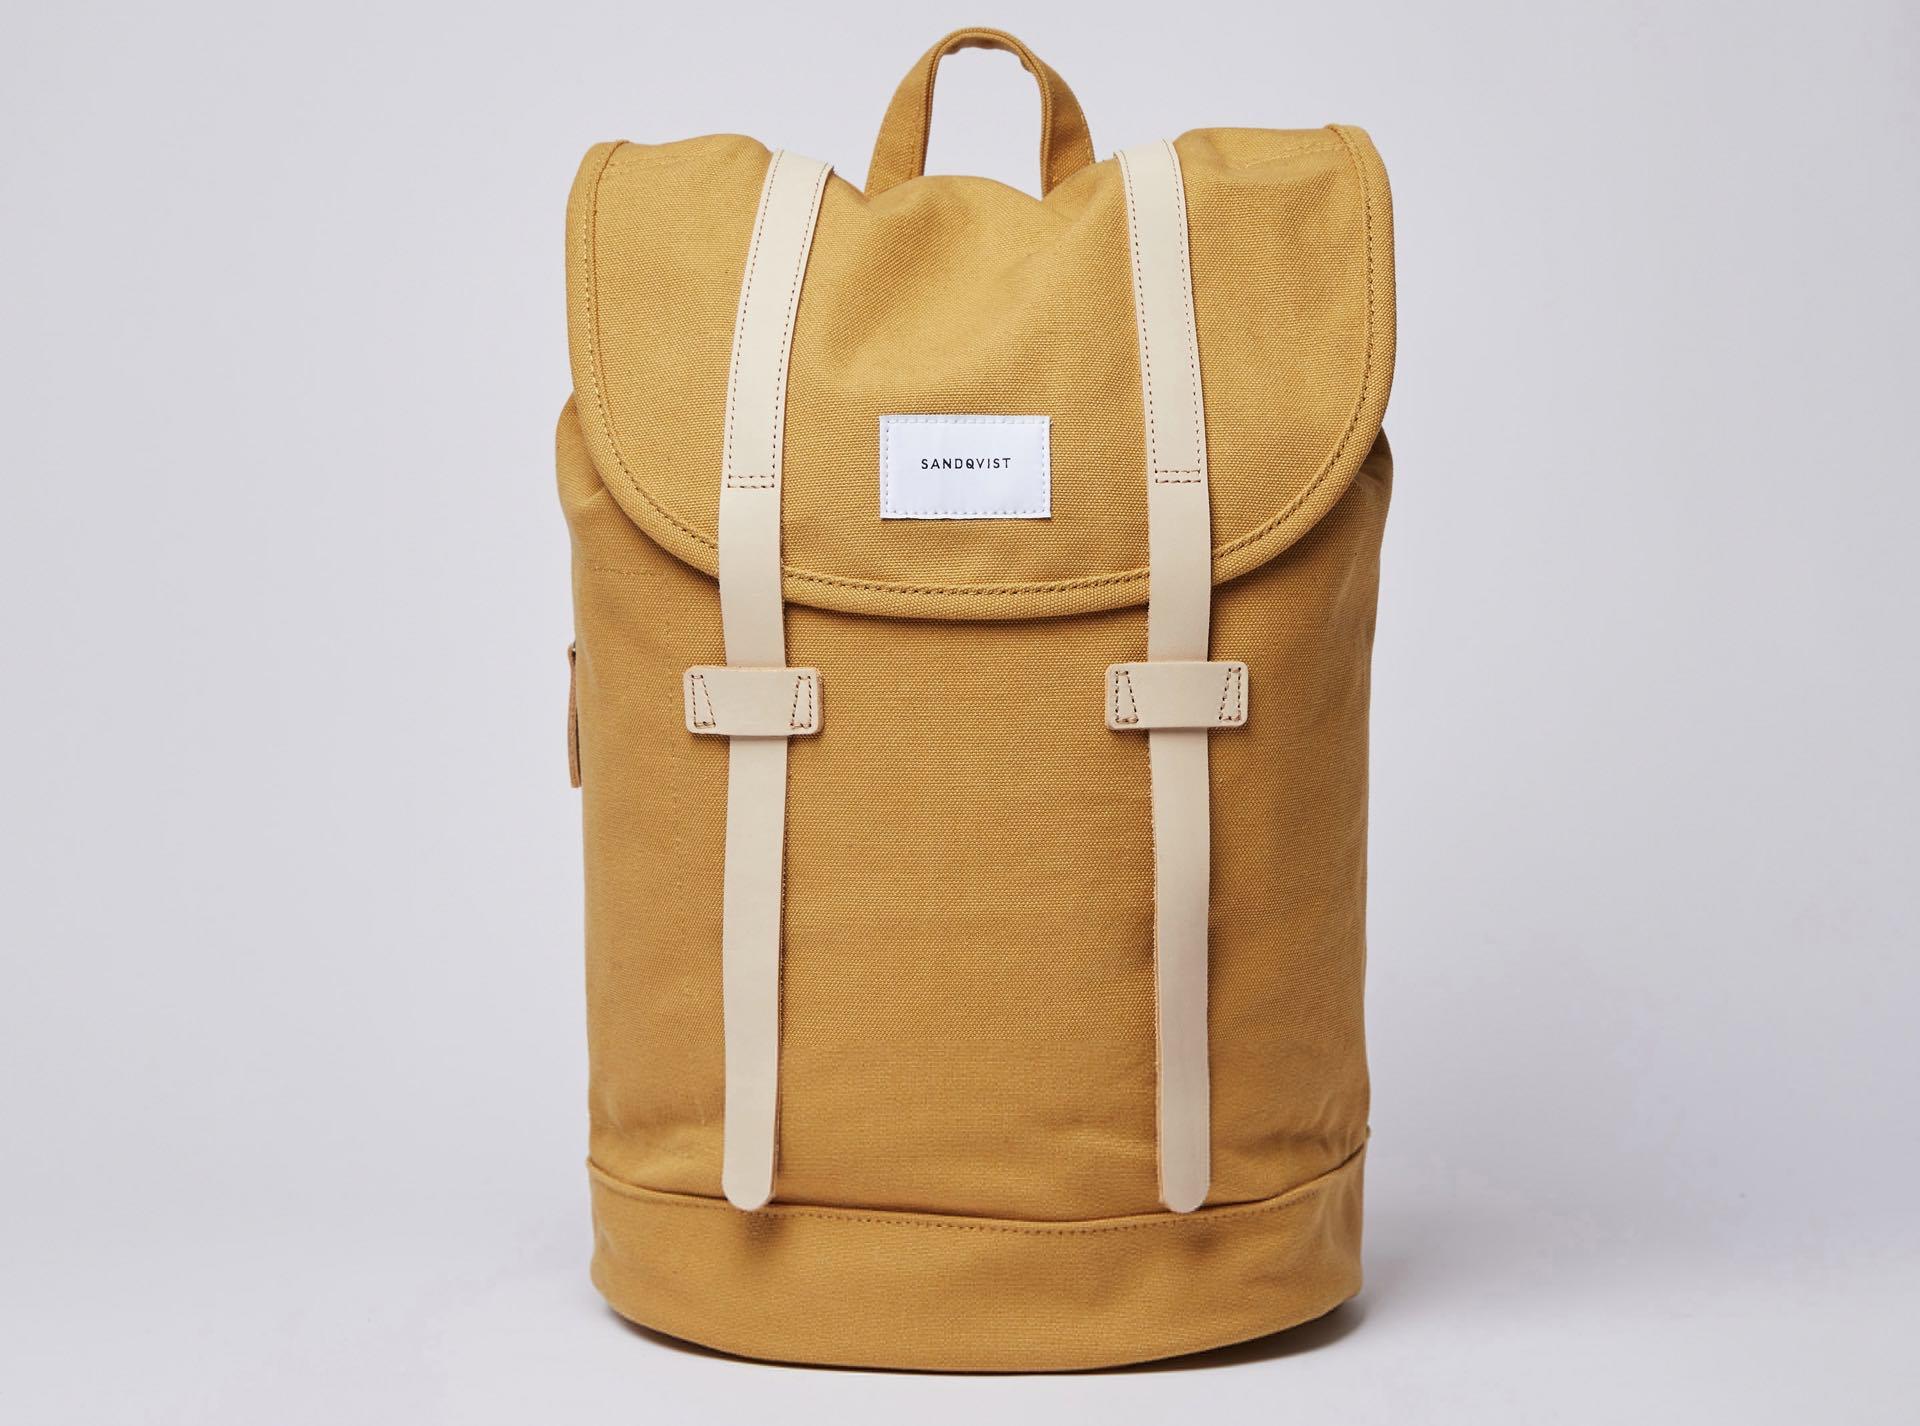 sandqvist-stig-backpack-in-honey-yellow